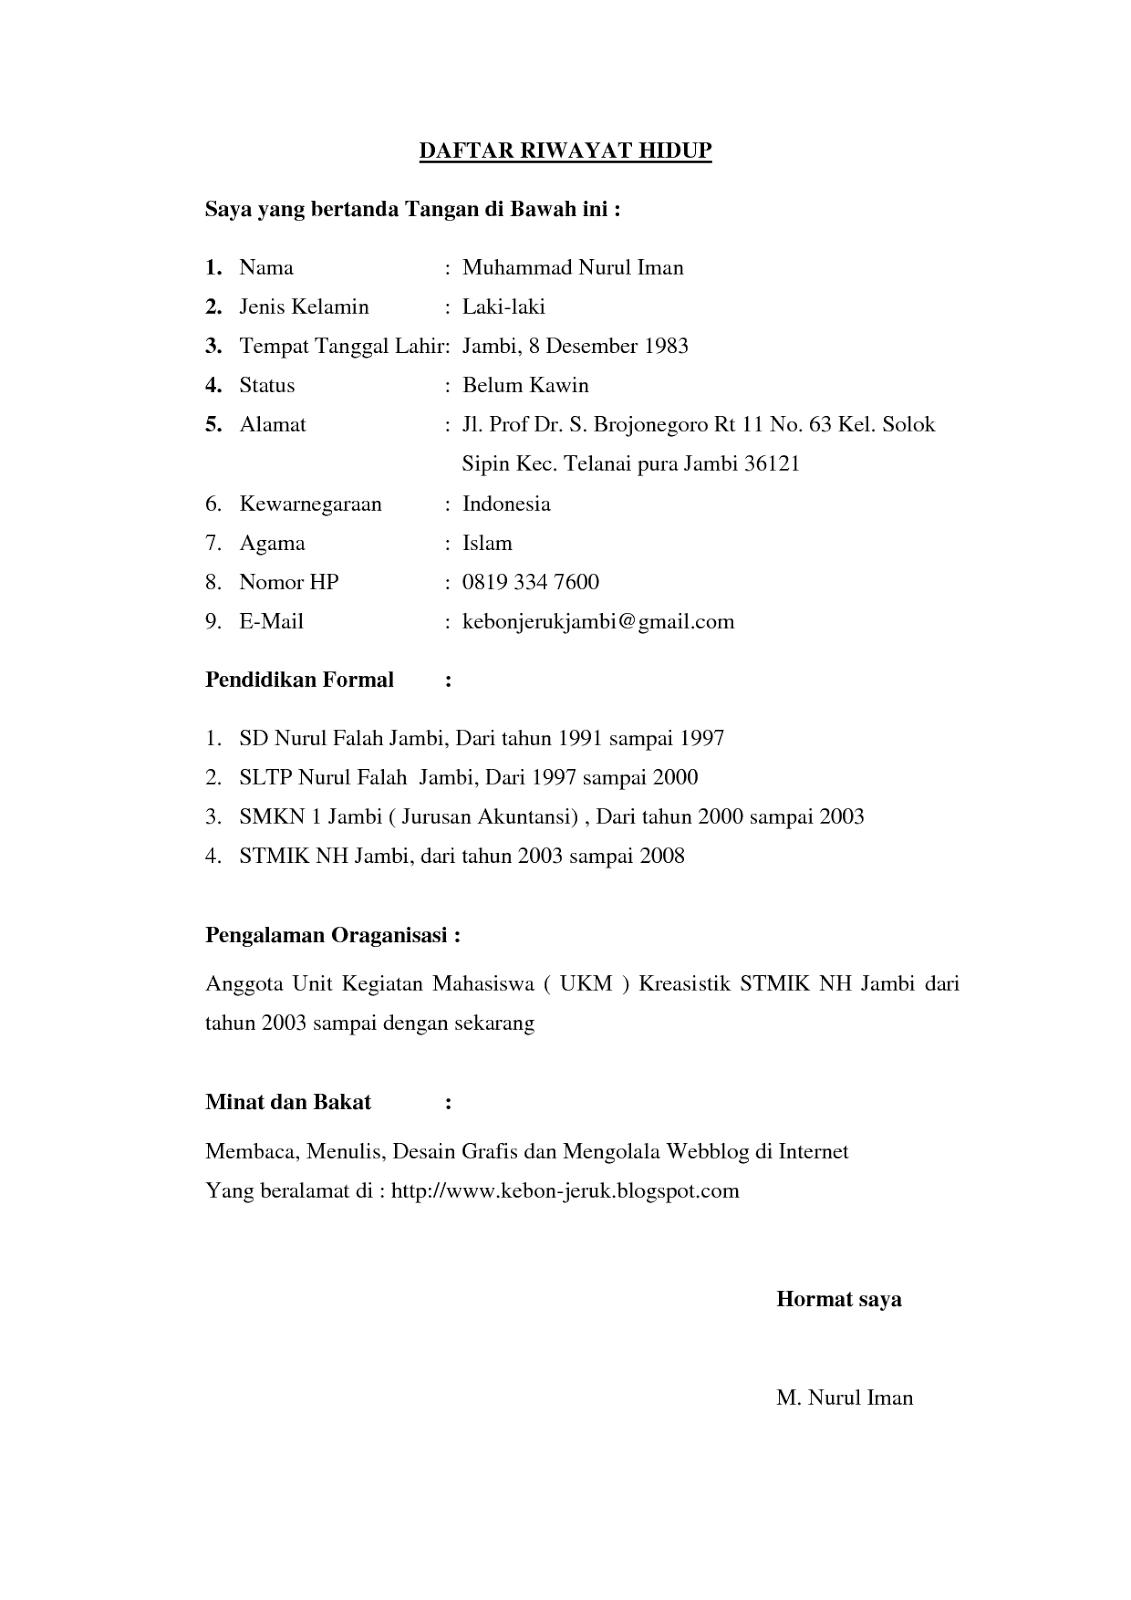 Contoh Daftar Riwayat Hidup Pelajar Sma Erectronic